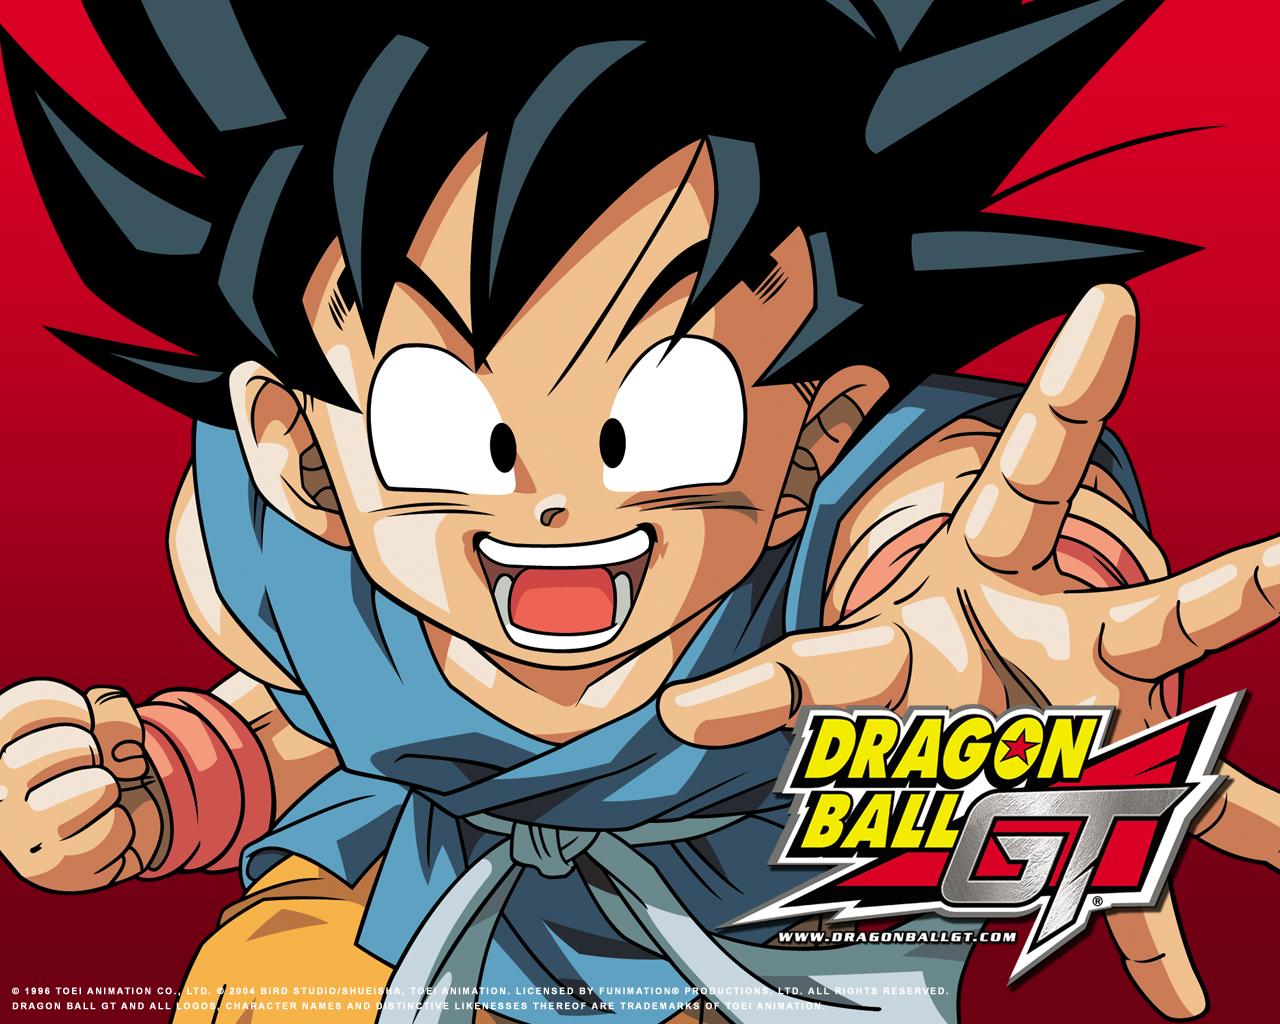 DRAGON BALL Z FANS: MAS IMAGENES DE DRAGON BALL AF Y GT